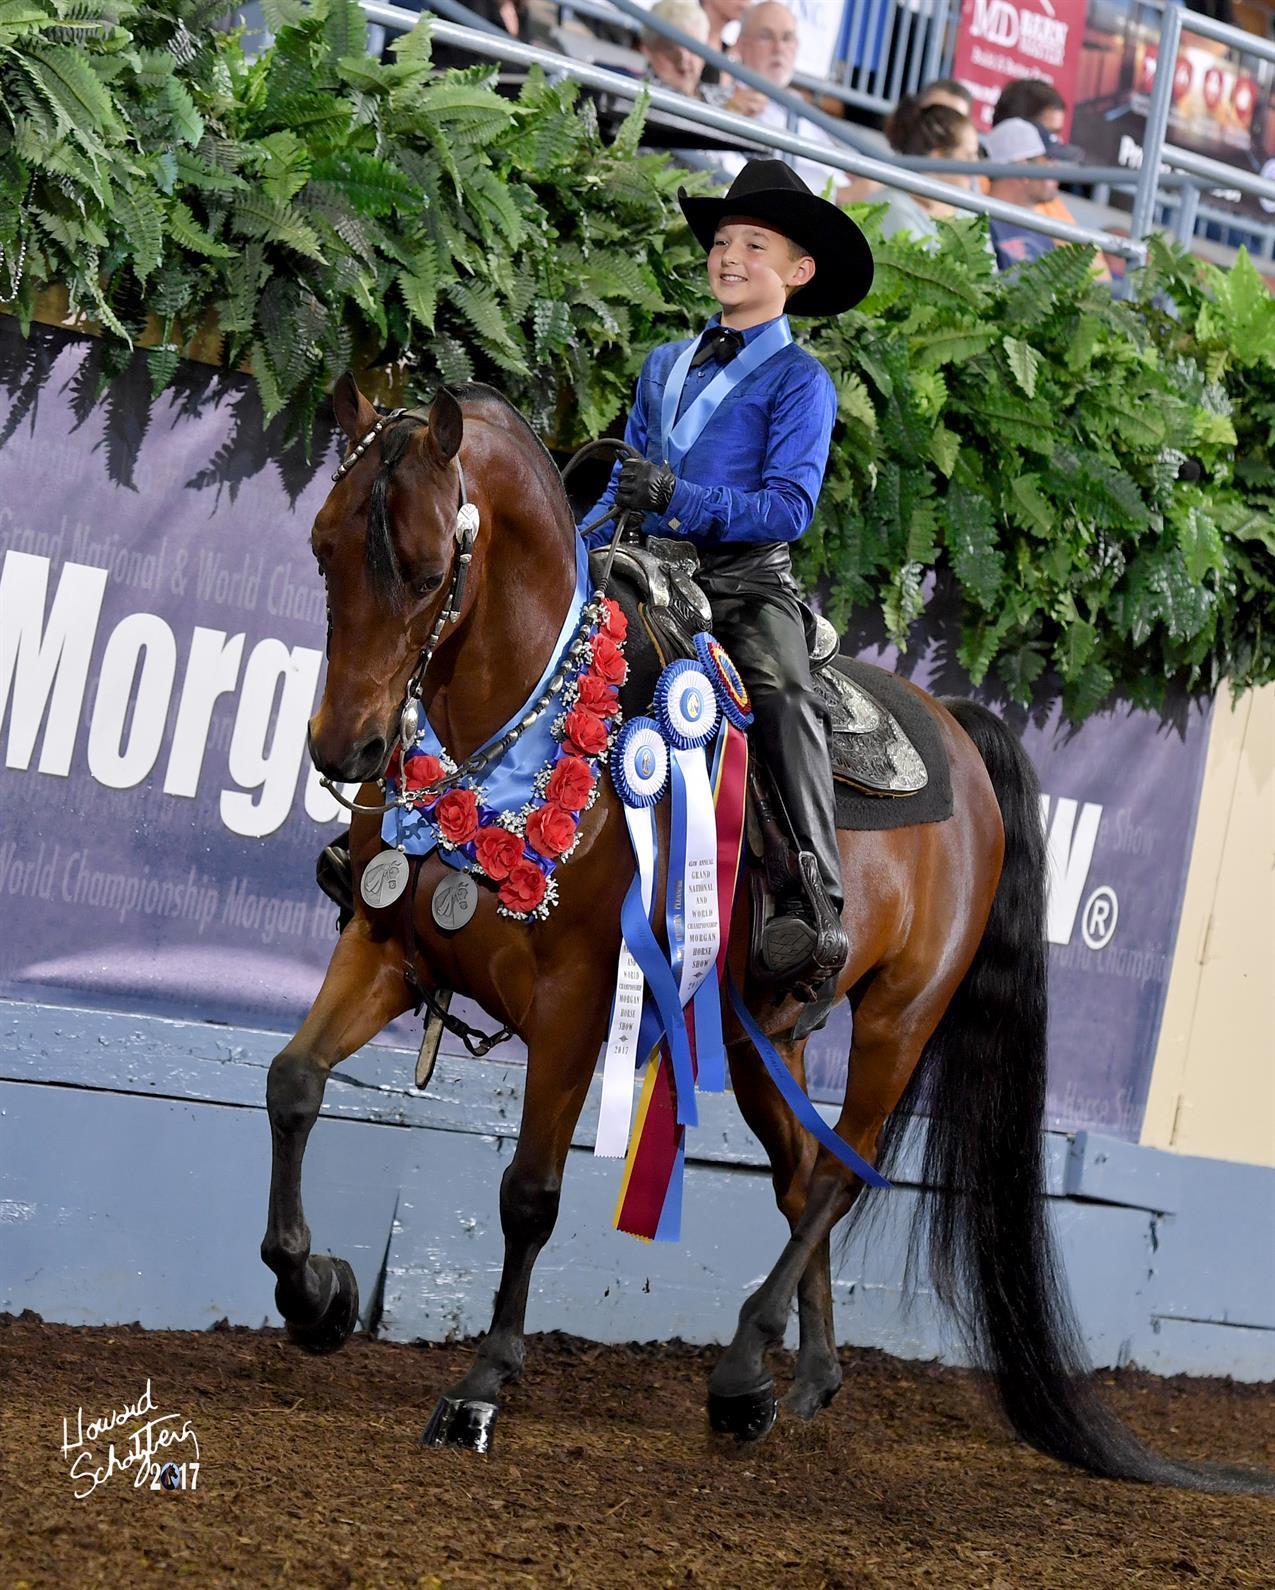 Morgan Horse Breed Celebrated In Oklahoma City Us Equestrian